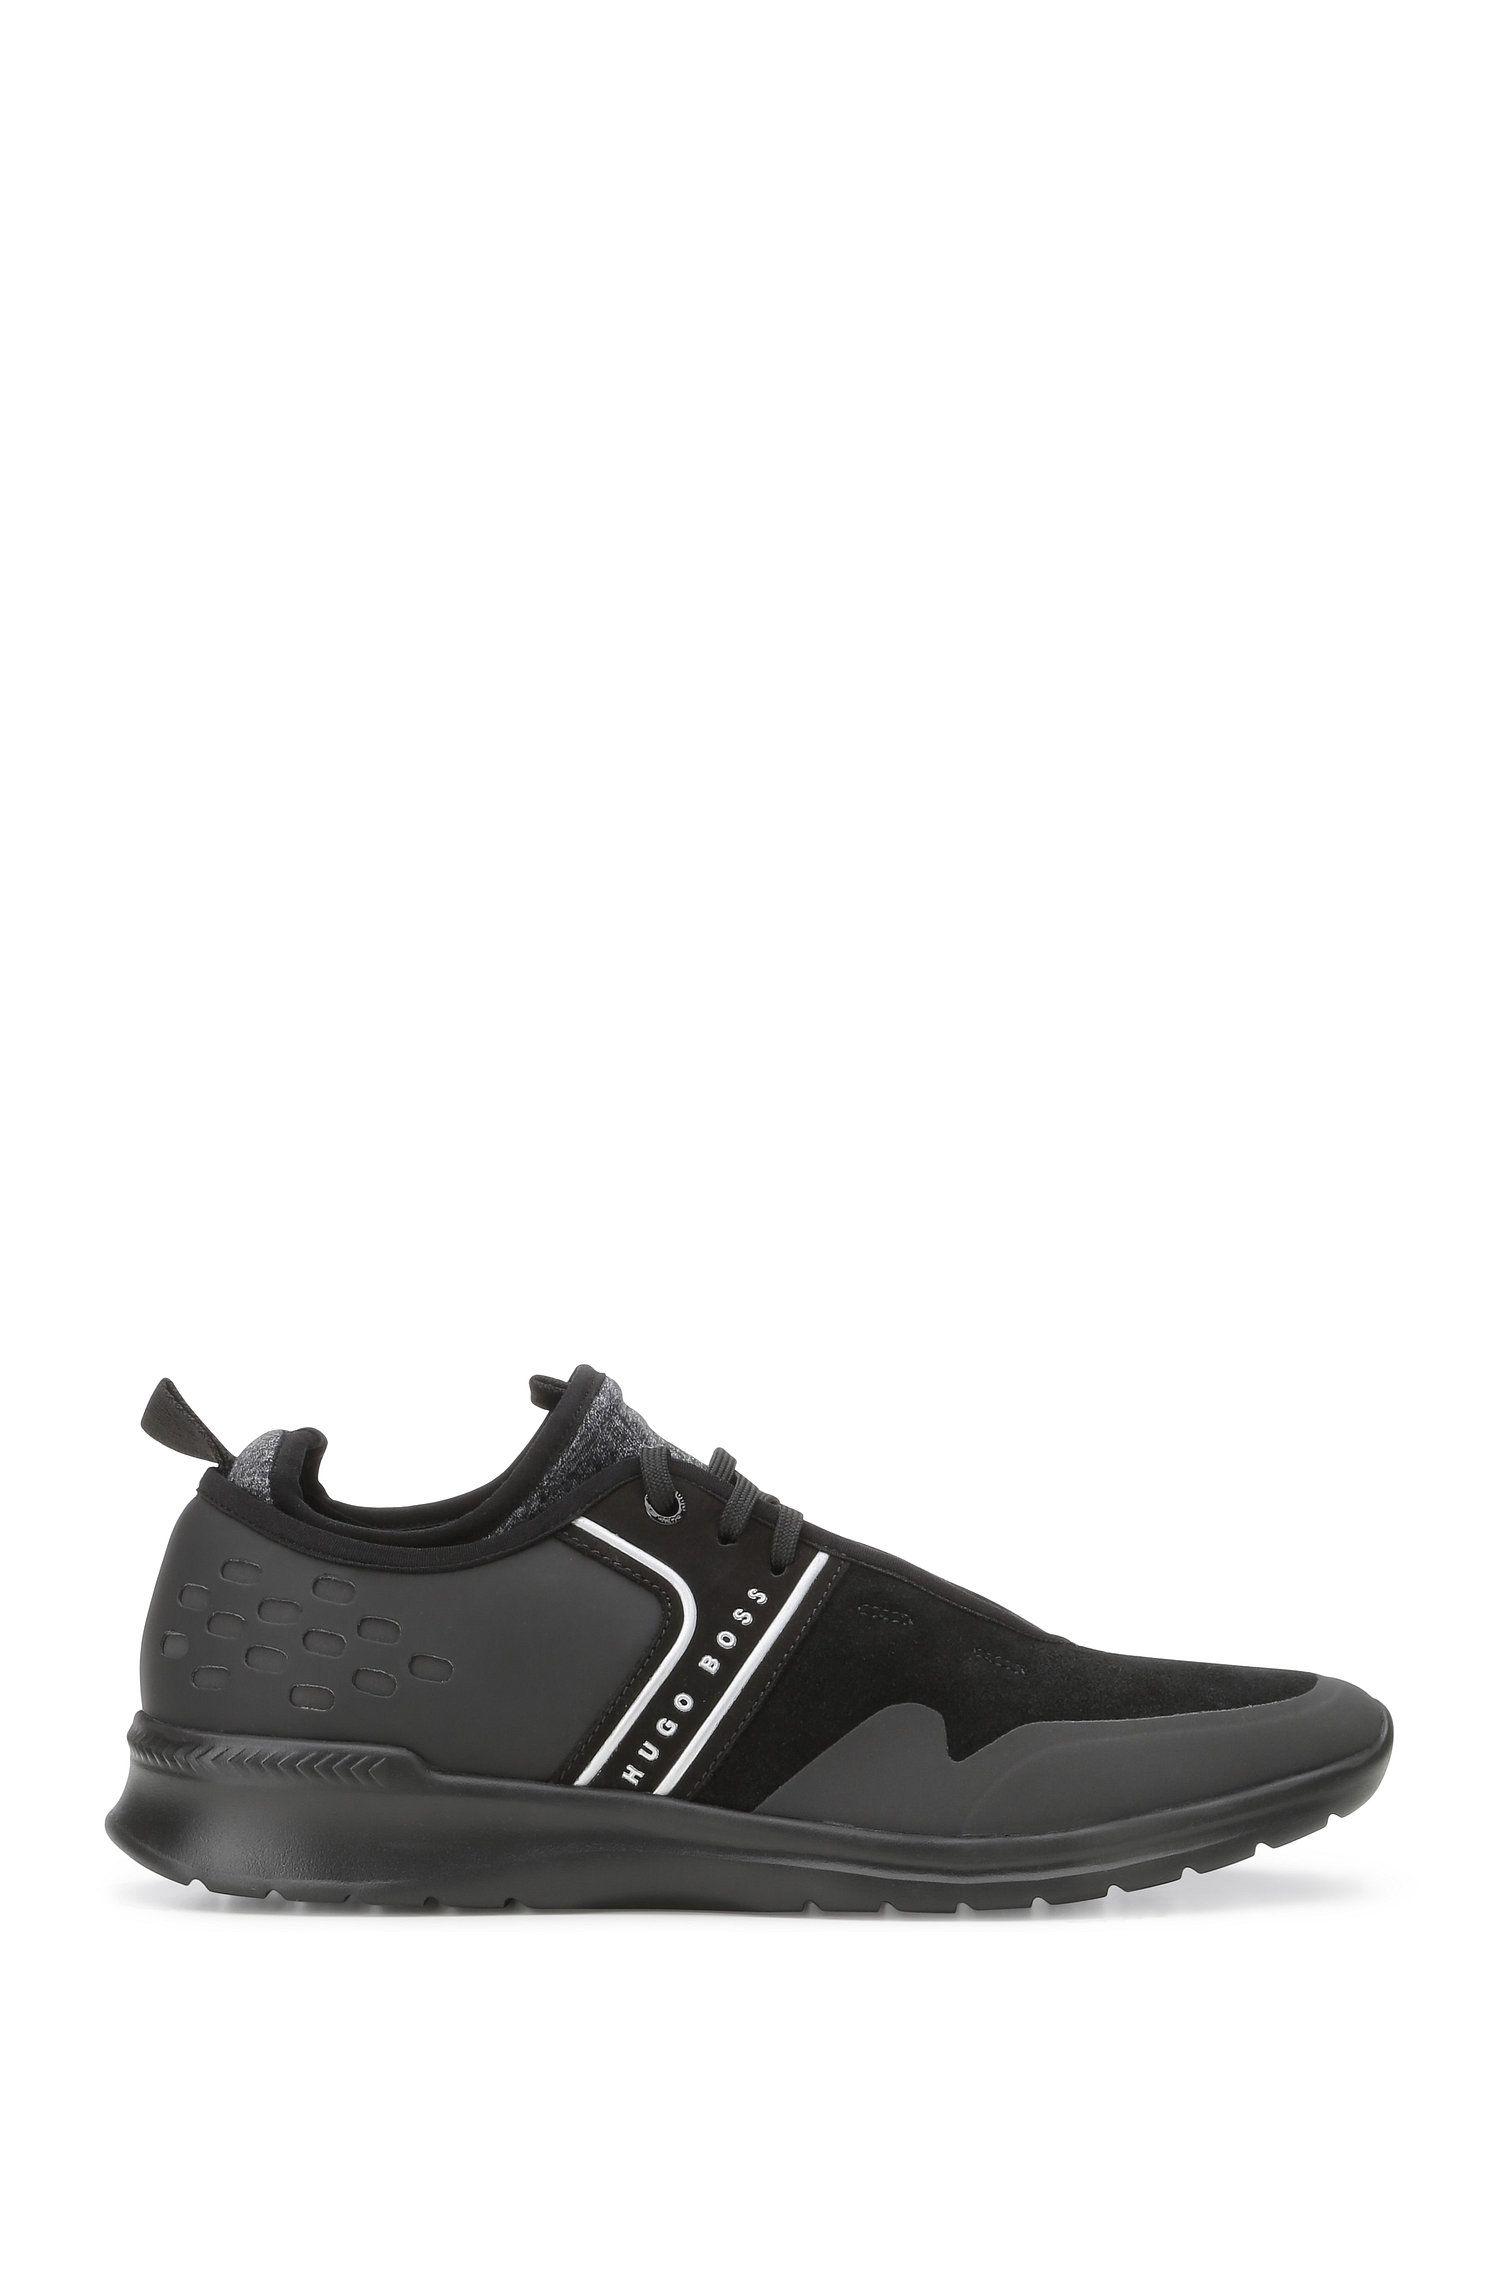 Sneakers aus Material-Mix mit Leder und Textil: ´Extreme_Runn_sdmx`